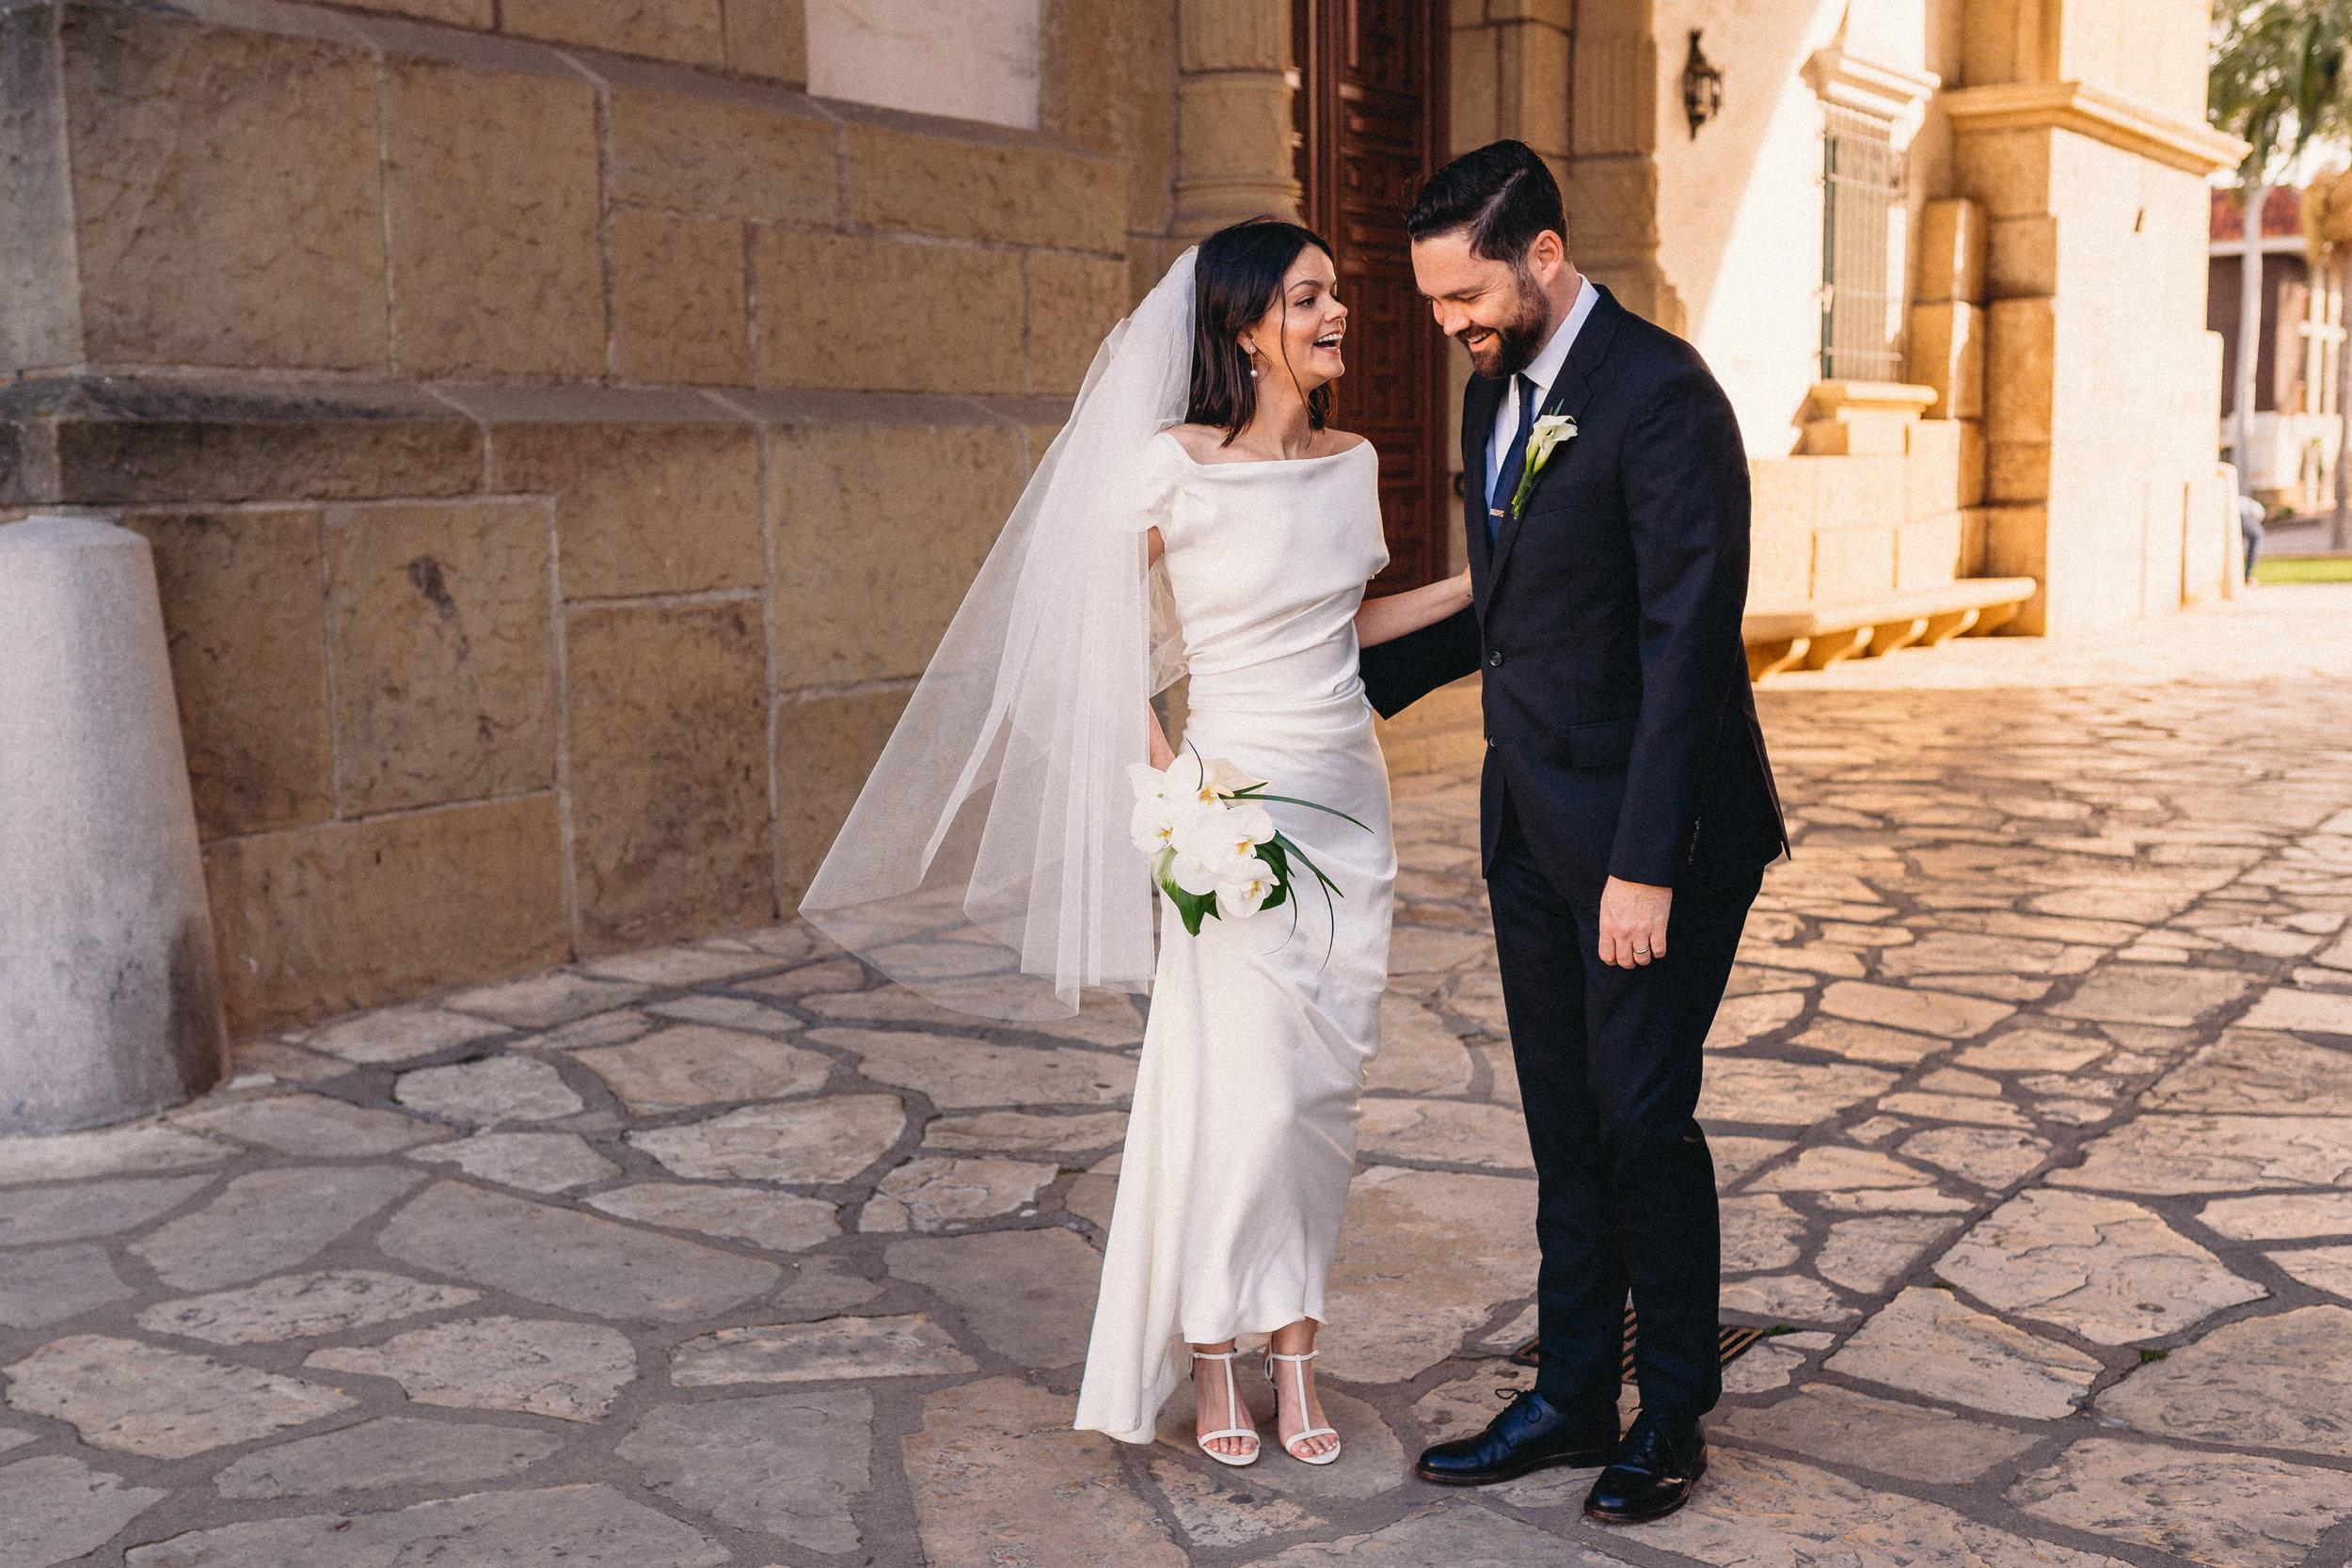 wedding-photography-santa-barbara-courthouse-rebeccaylasotras-138.jpg